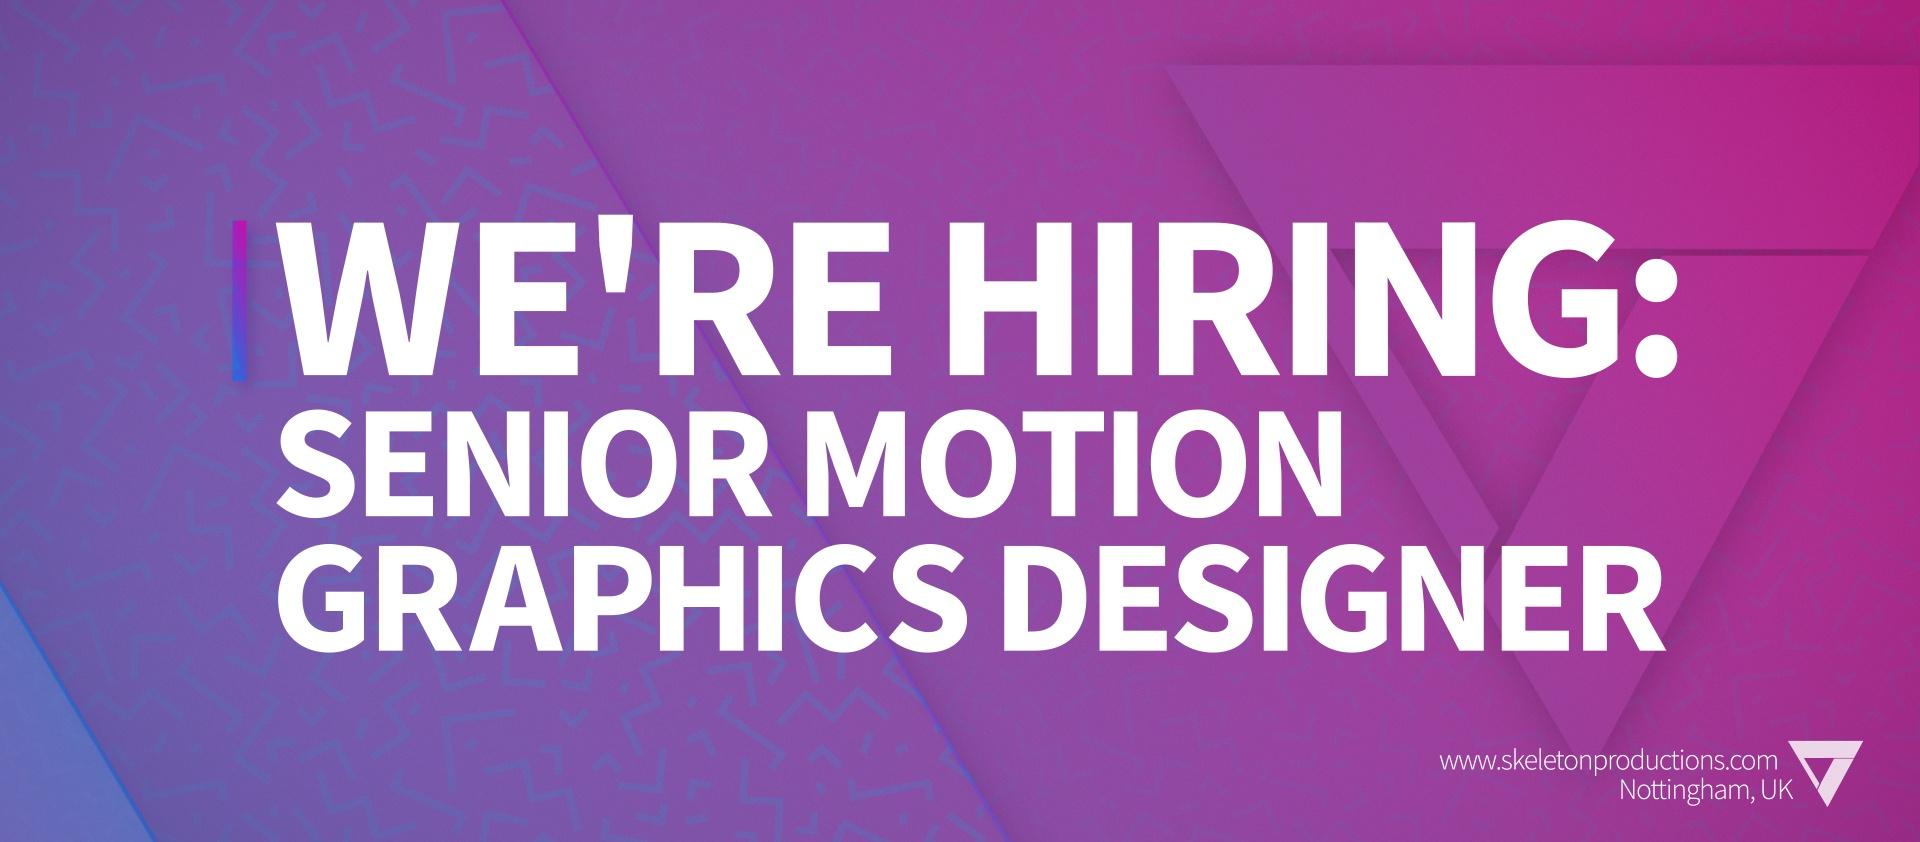 We're Hiring: Senior Motion Graphics Designer featured image